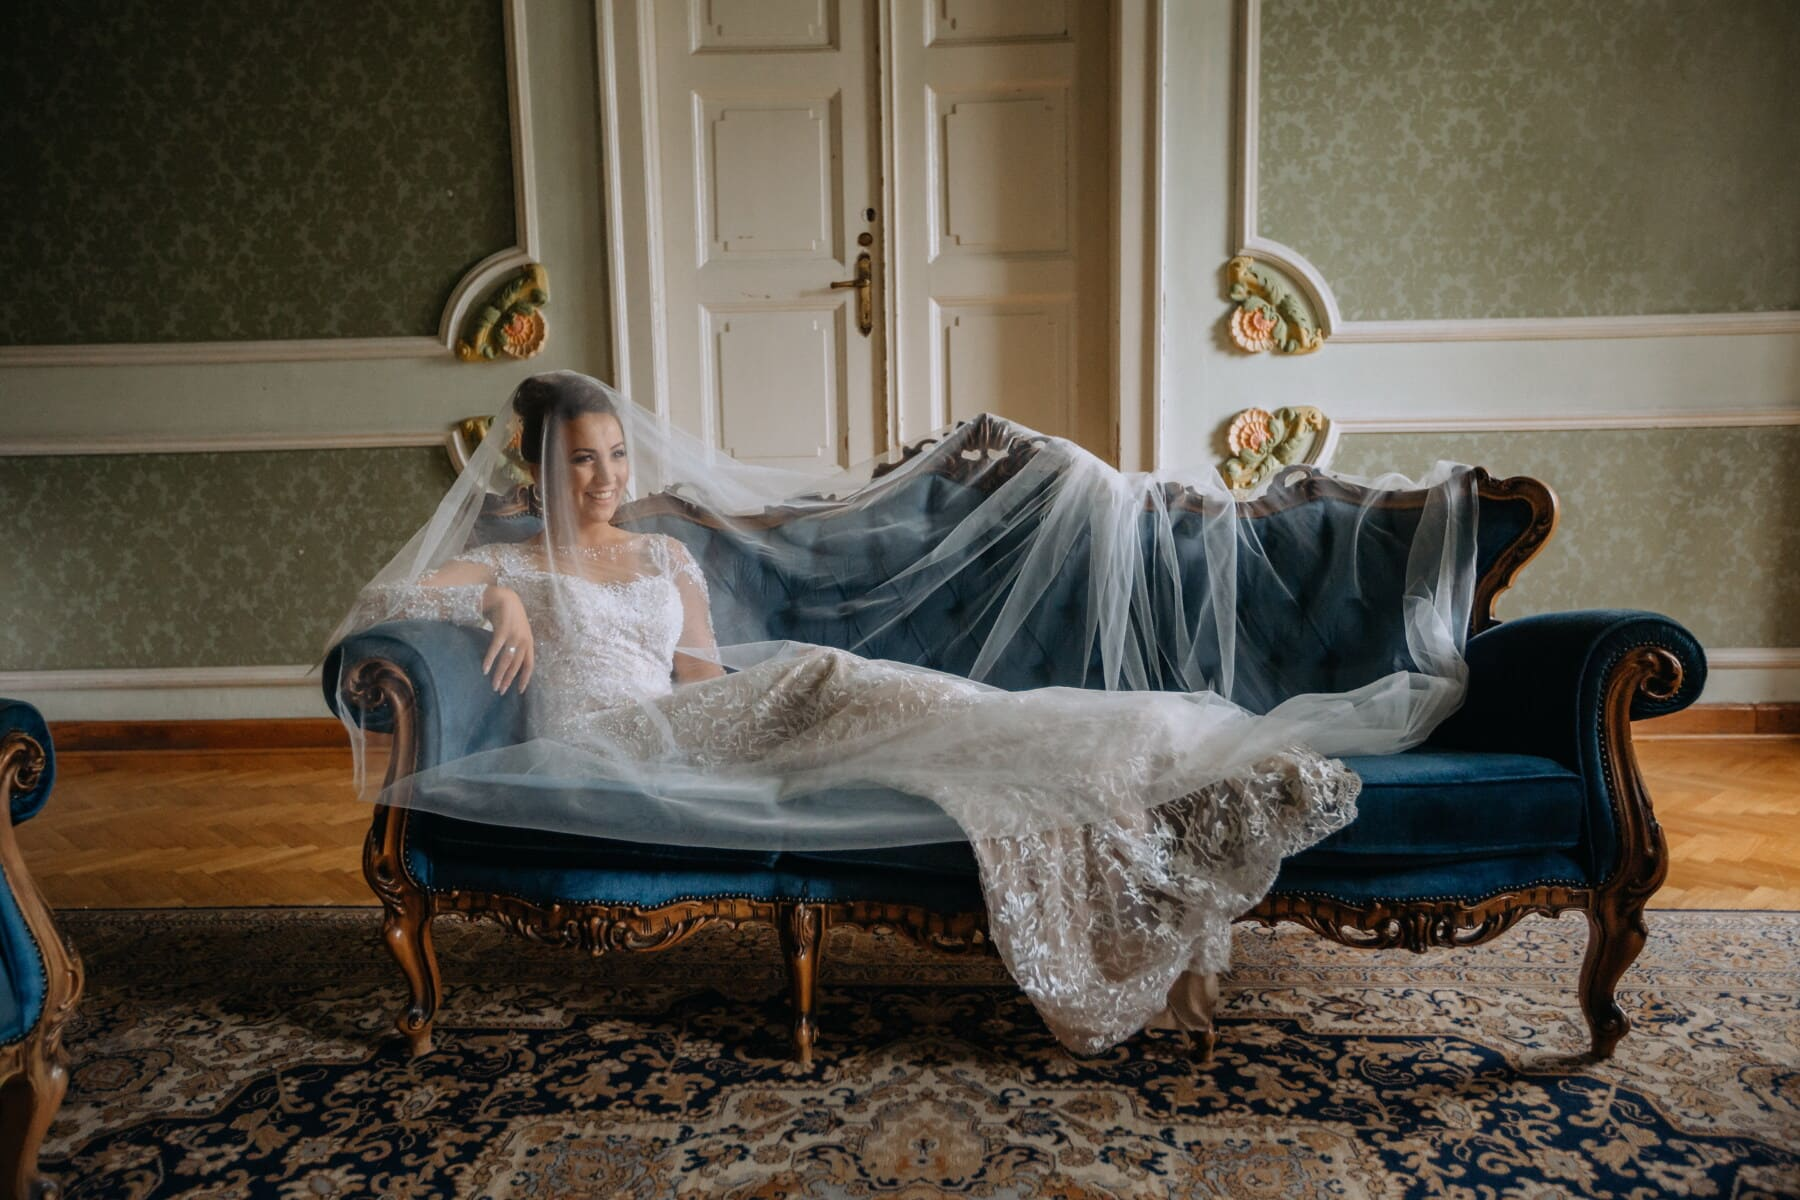 sofá, noiva, barroco, que fixa, vestido de casamento, véu, estilo de vida, fantasia, luxo, interior